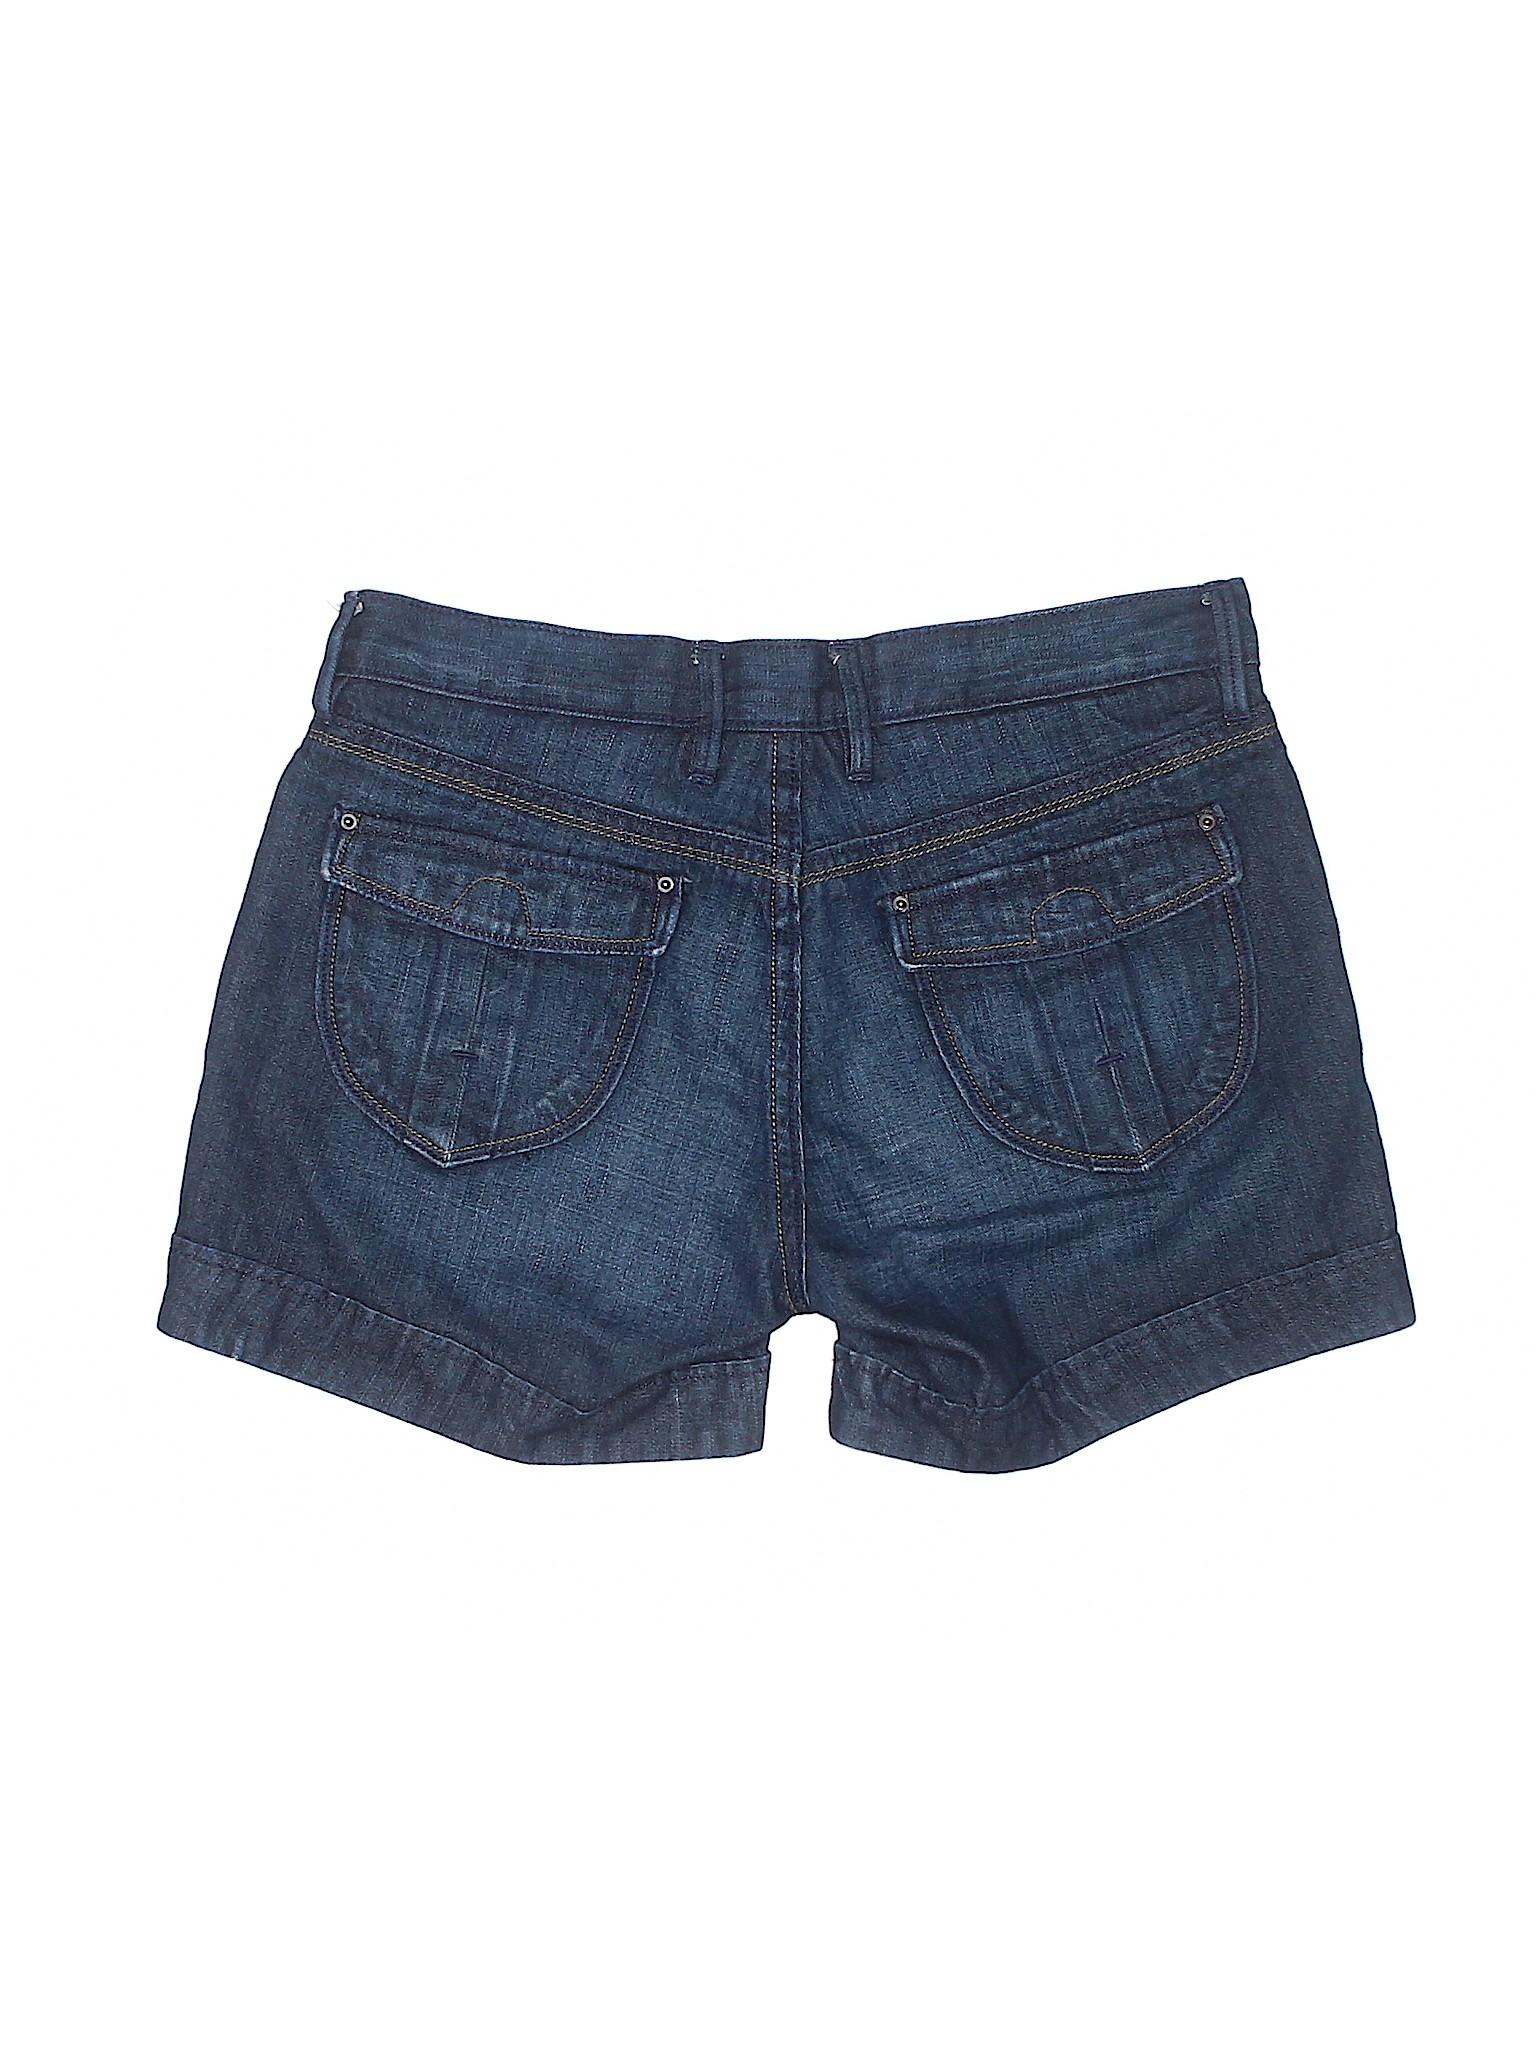 Shorts winter Denim Old Boutique Navy g0wU7xFq